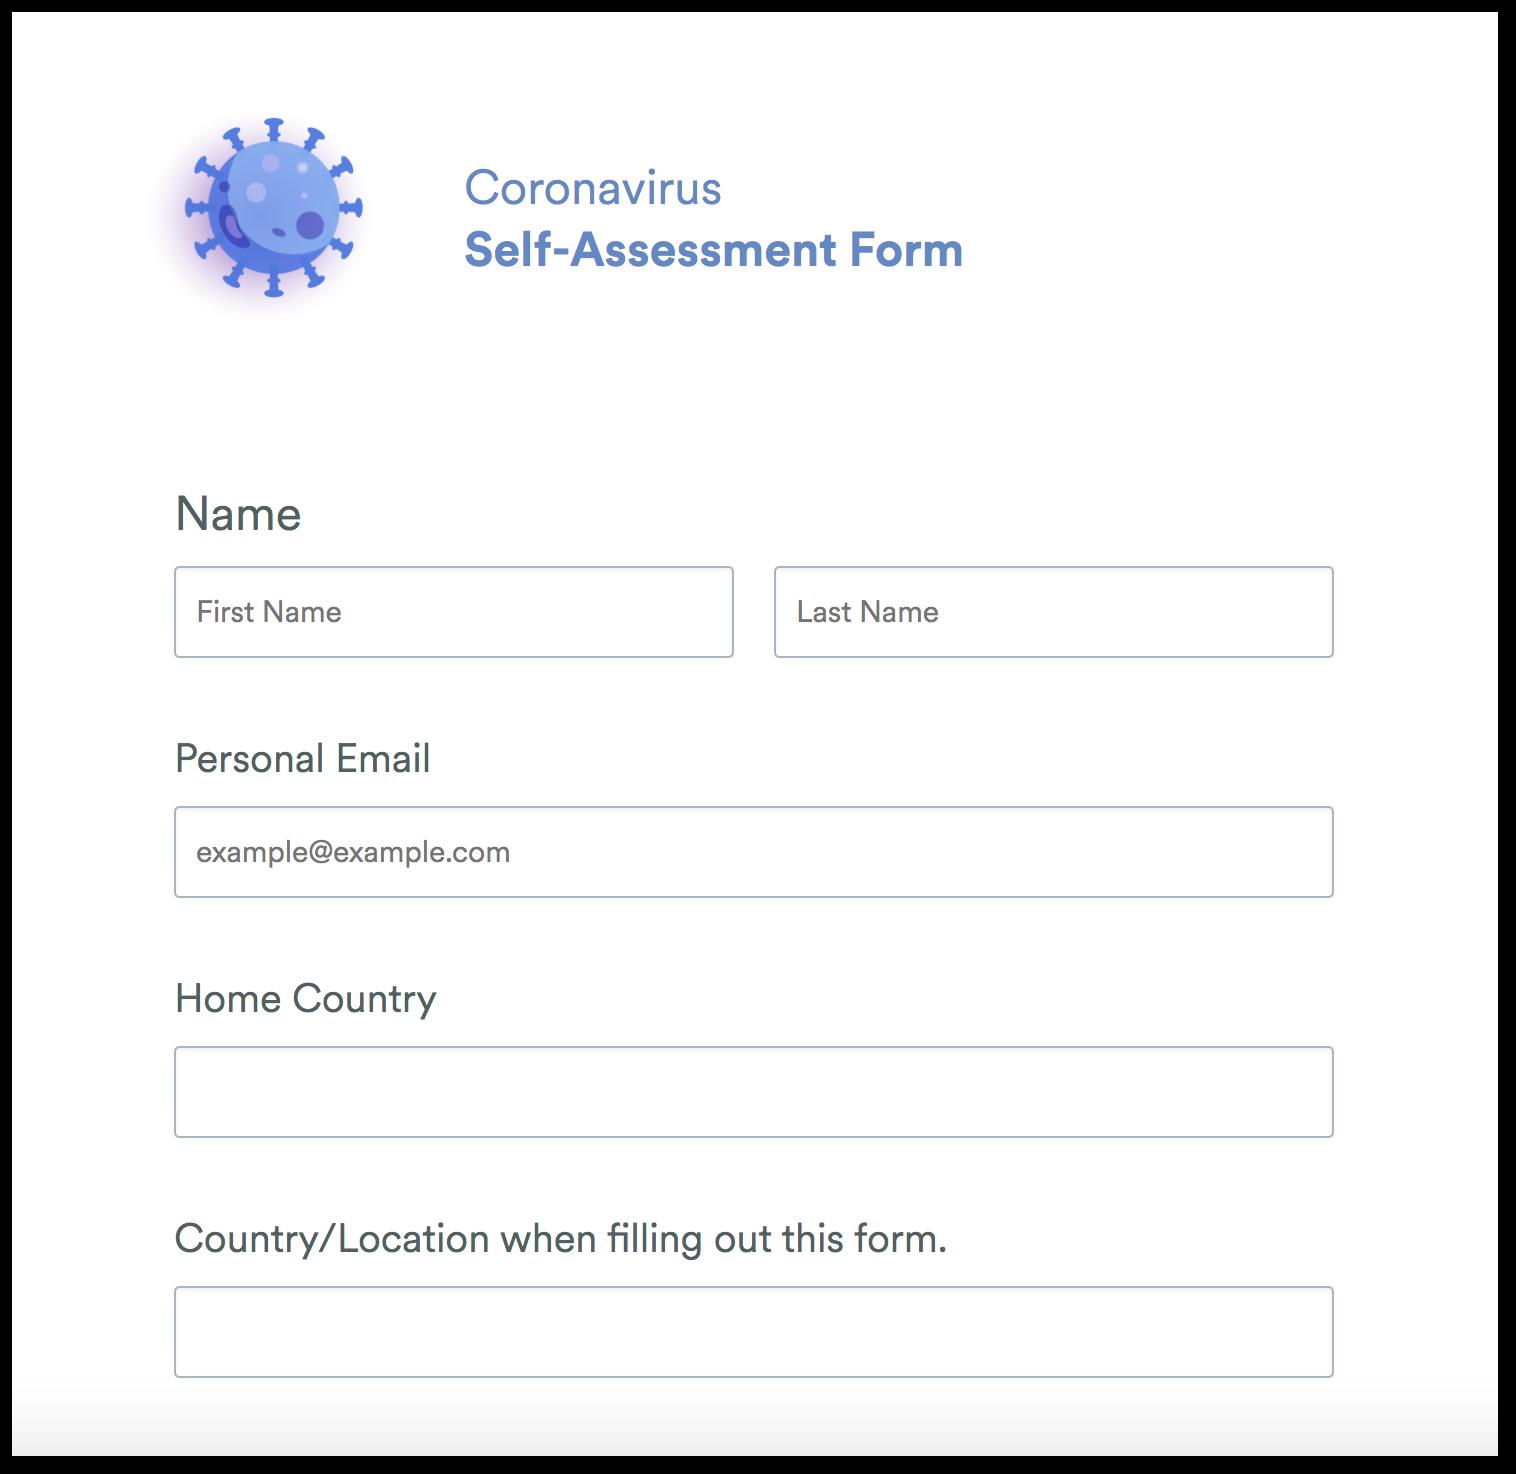 Coronavirus Self Assessment Form Template Jotform You cringe at the mere. coronavirus self assessment form